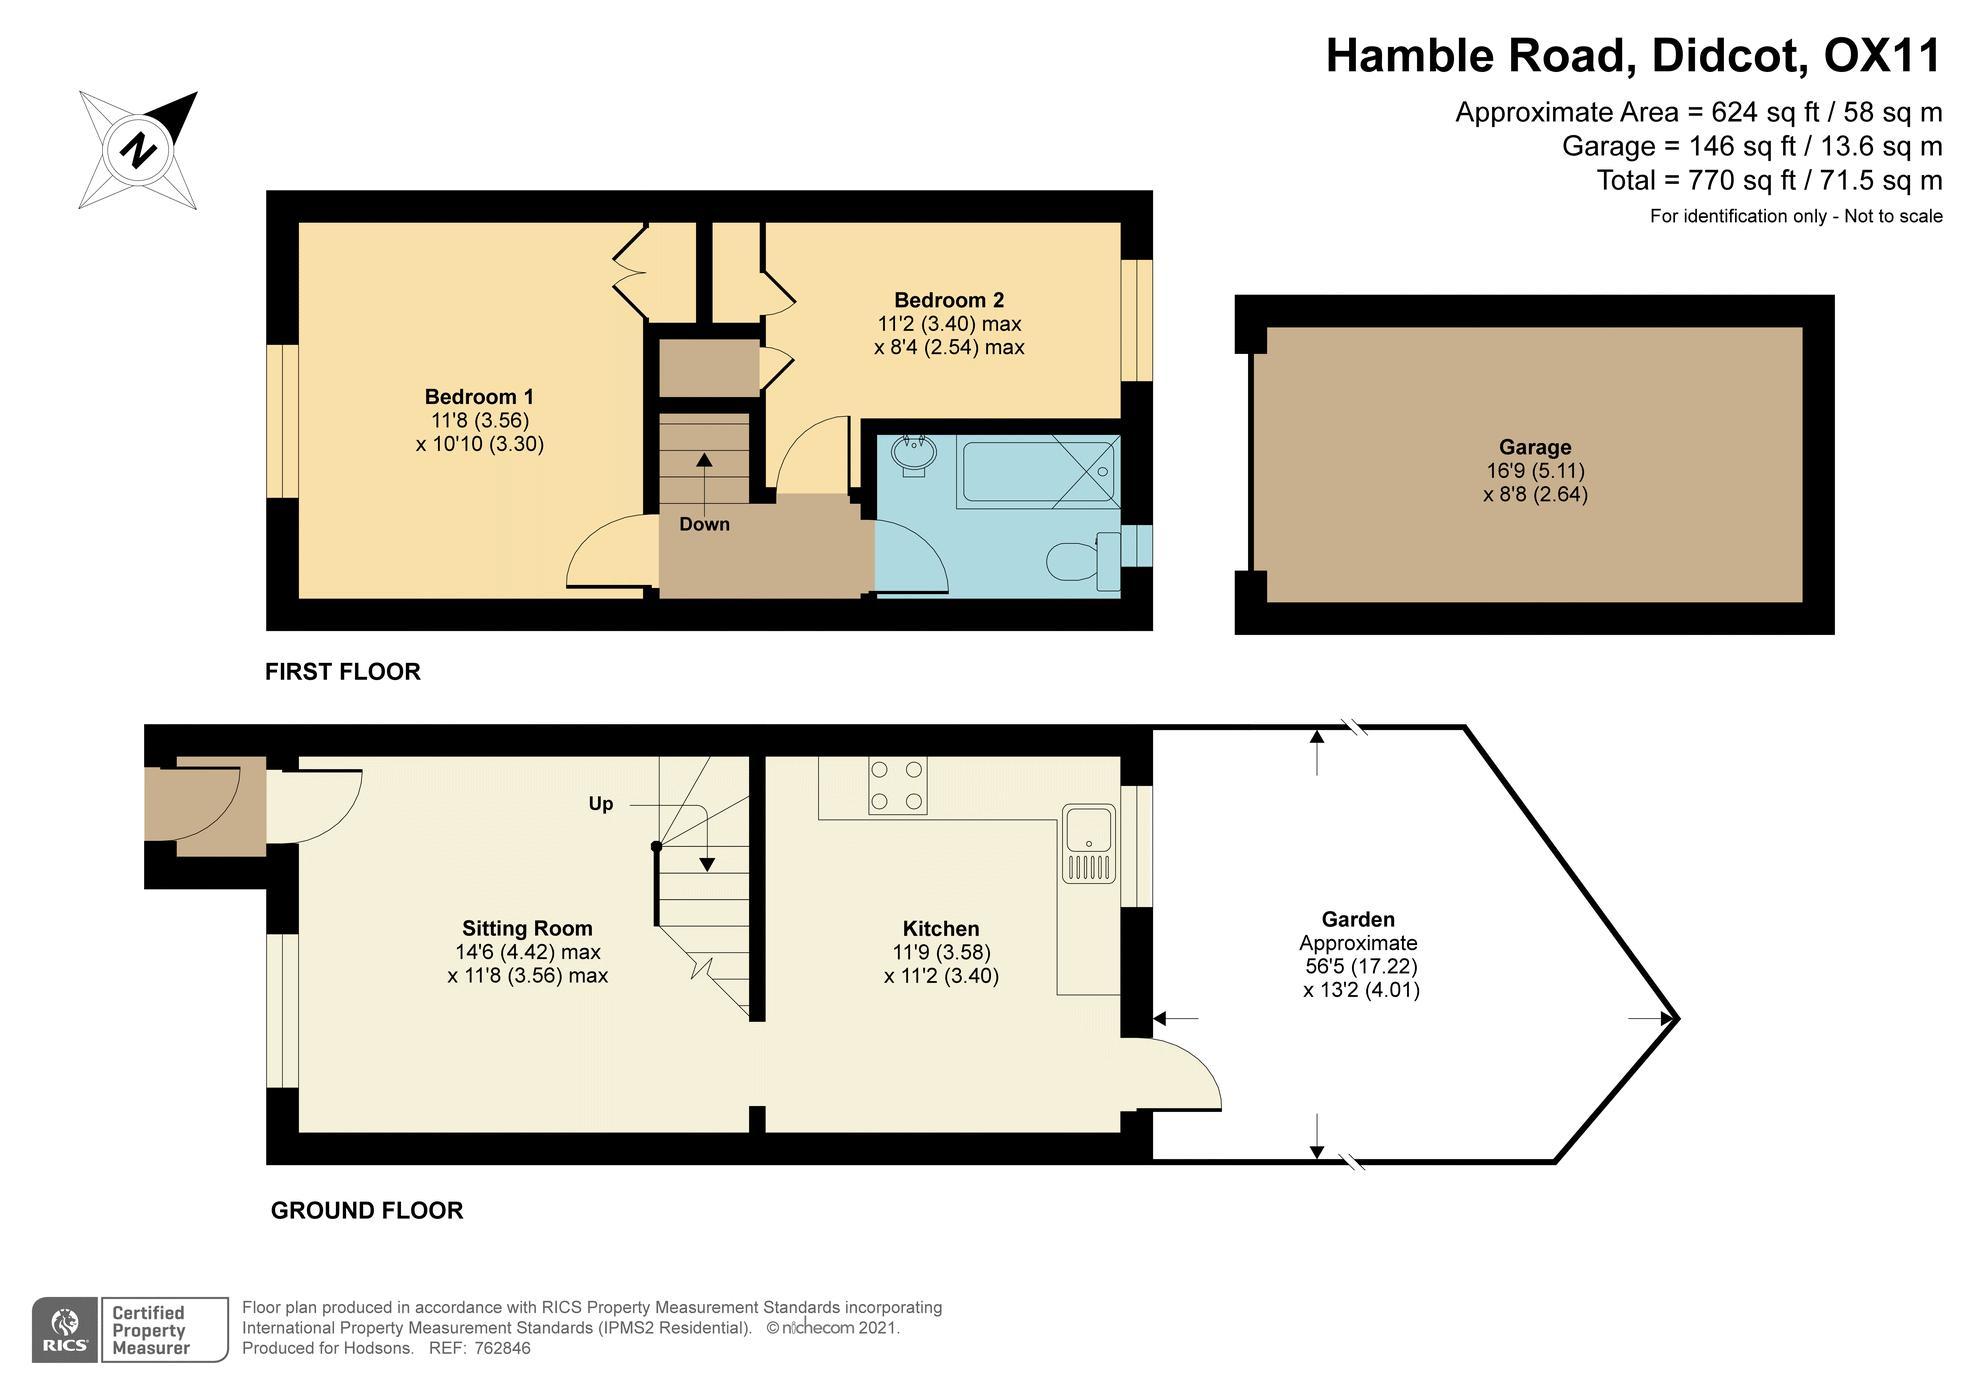 Hamble Road